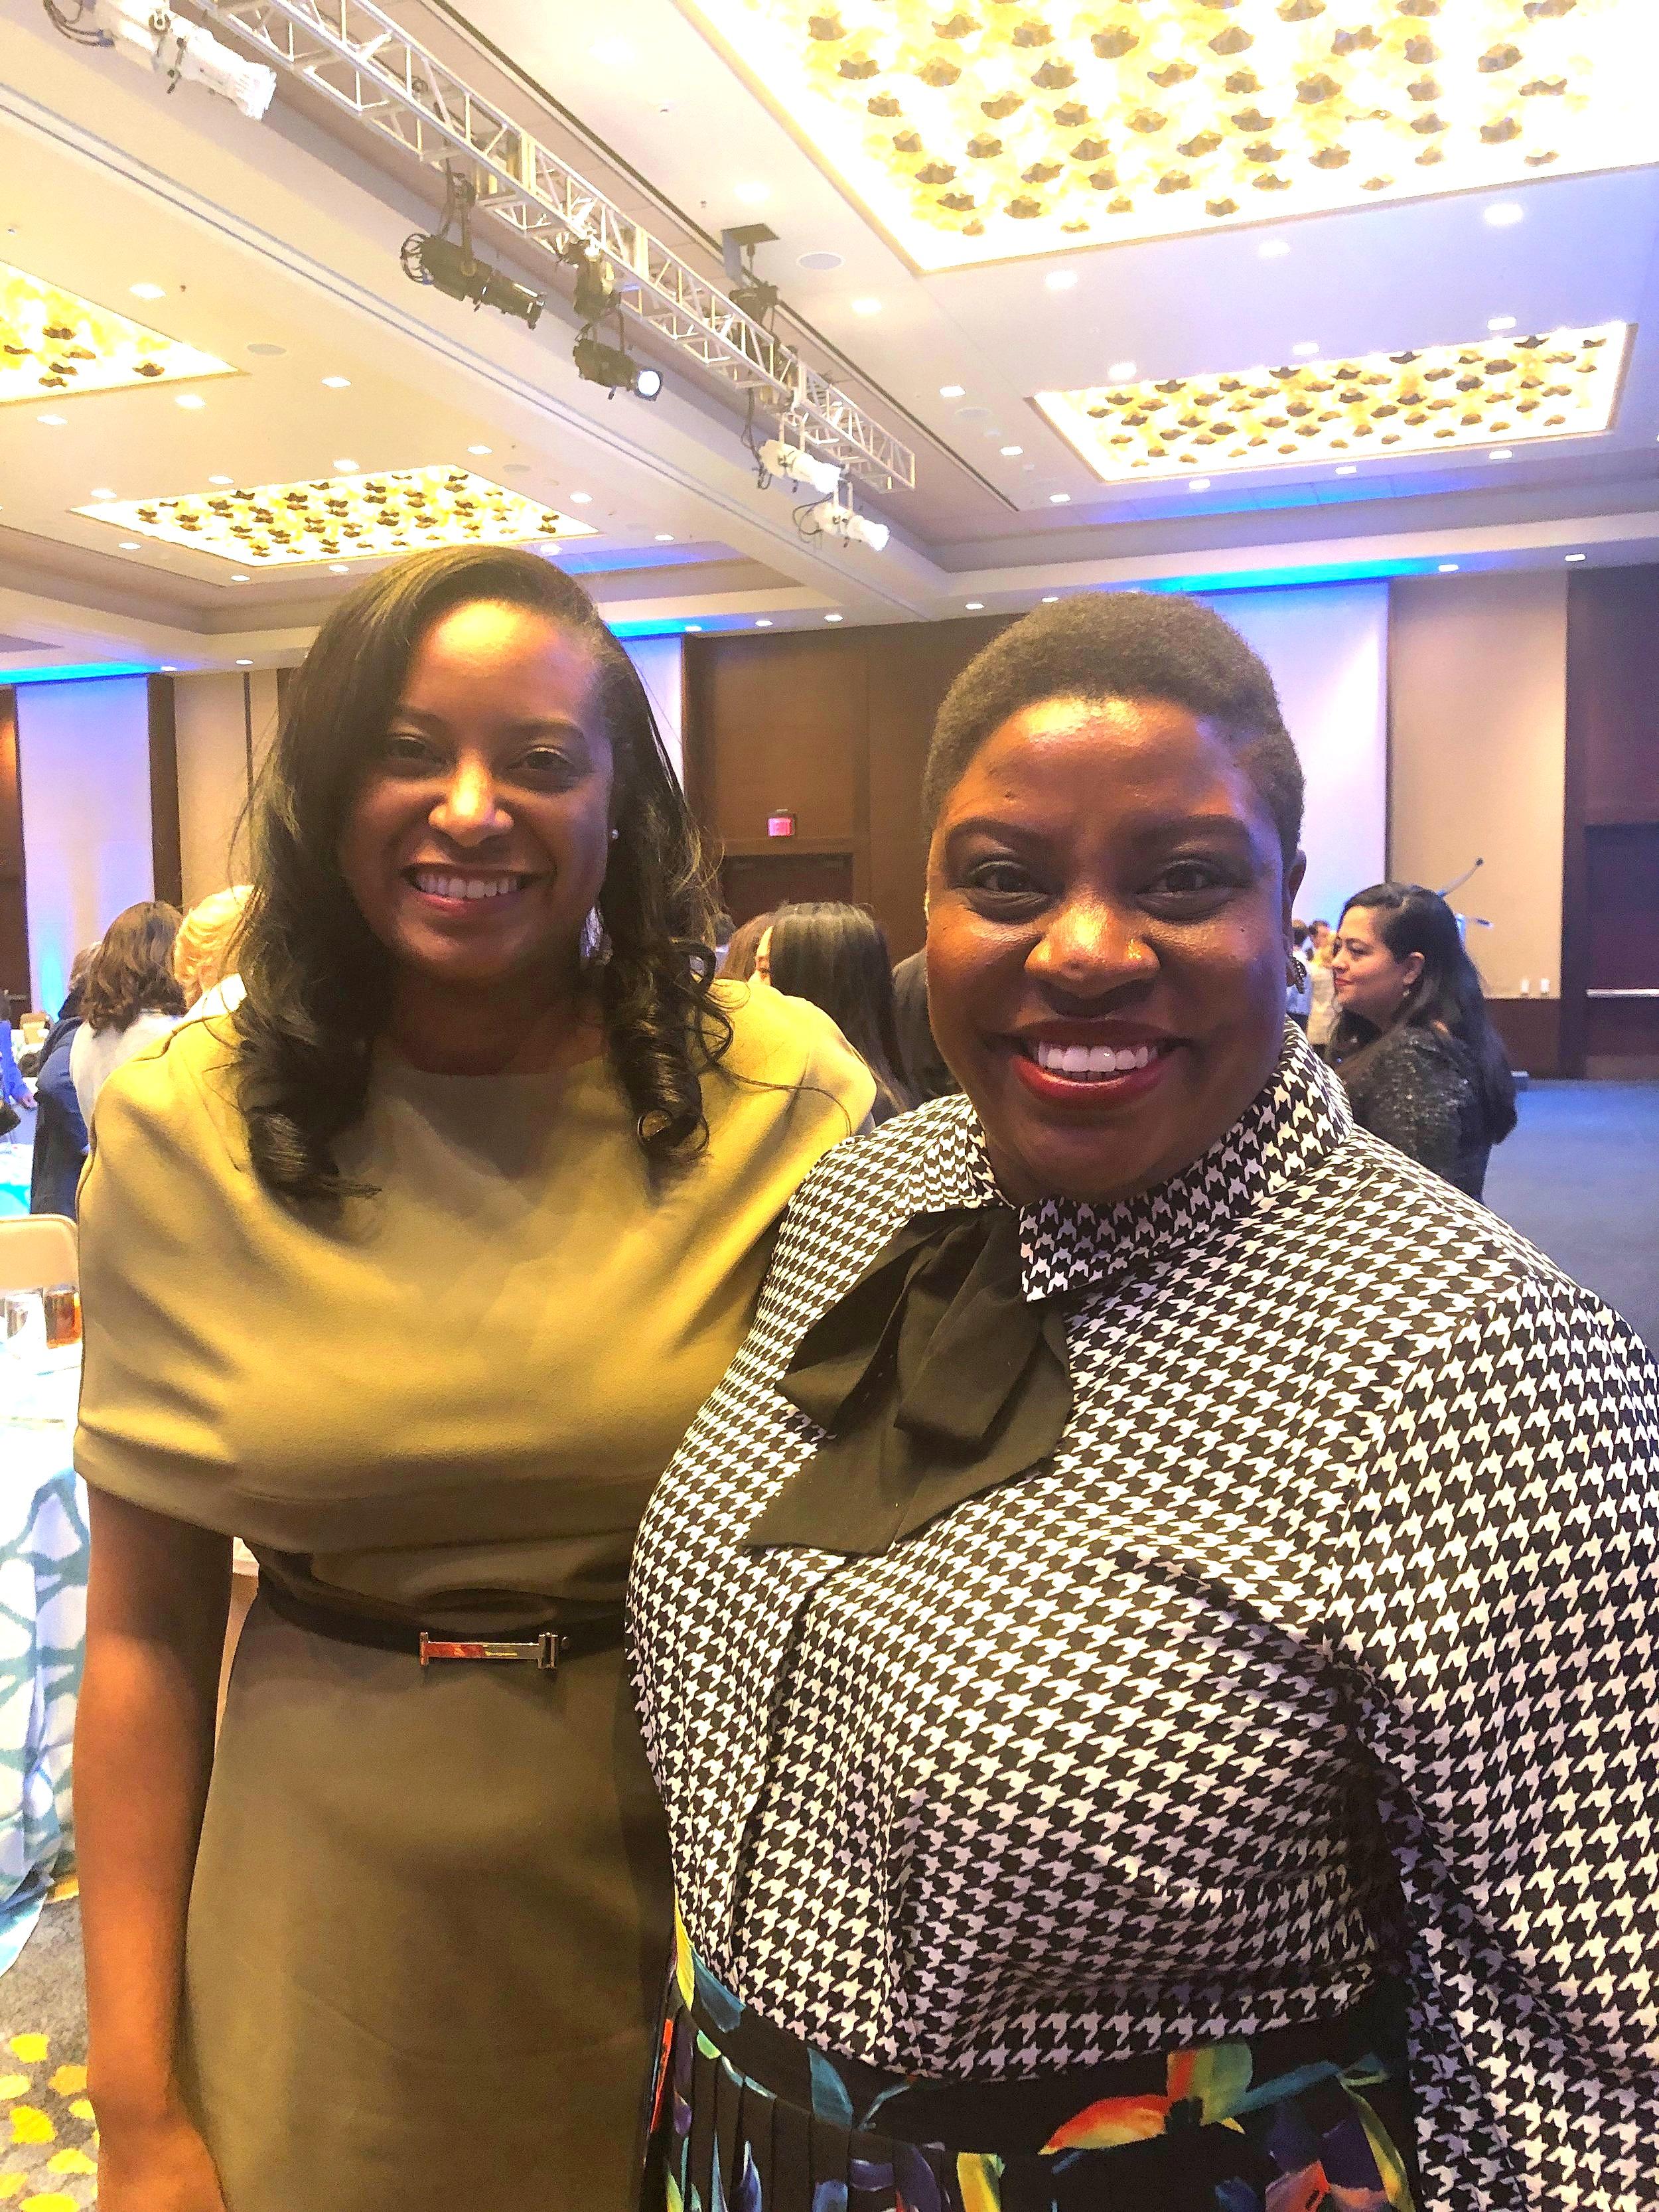 Me with VA State Rep Jennifer Carroll Foy